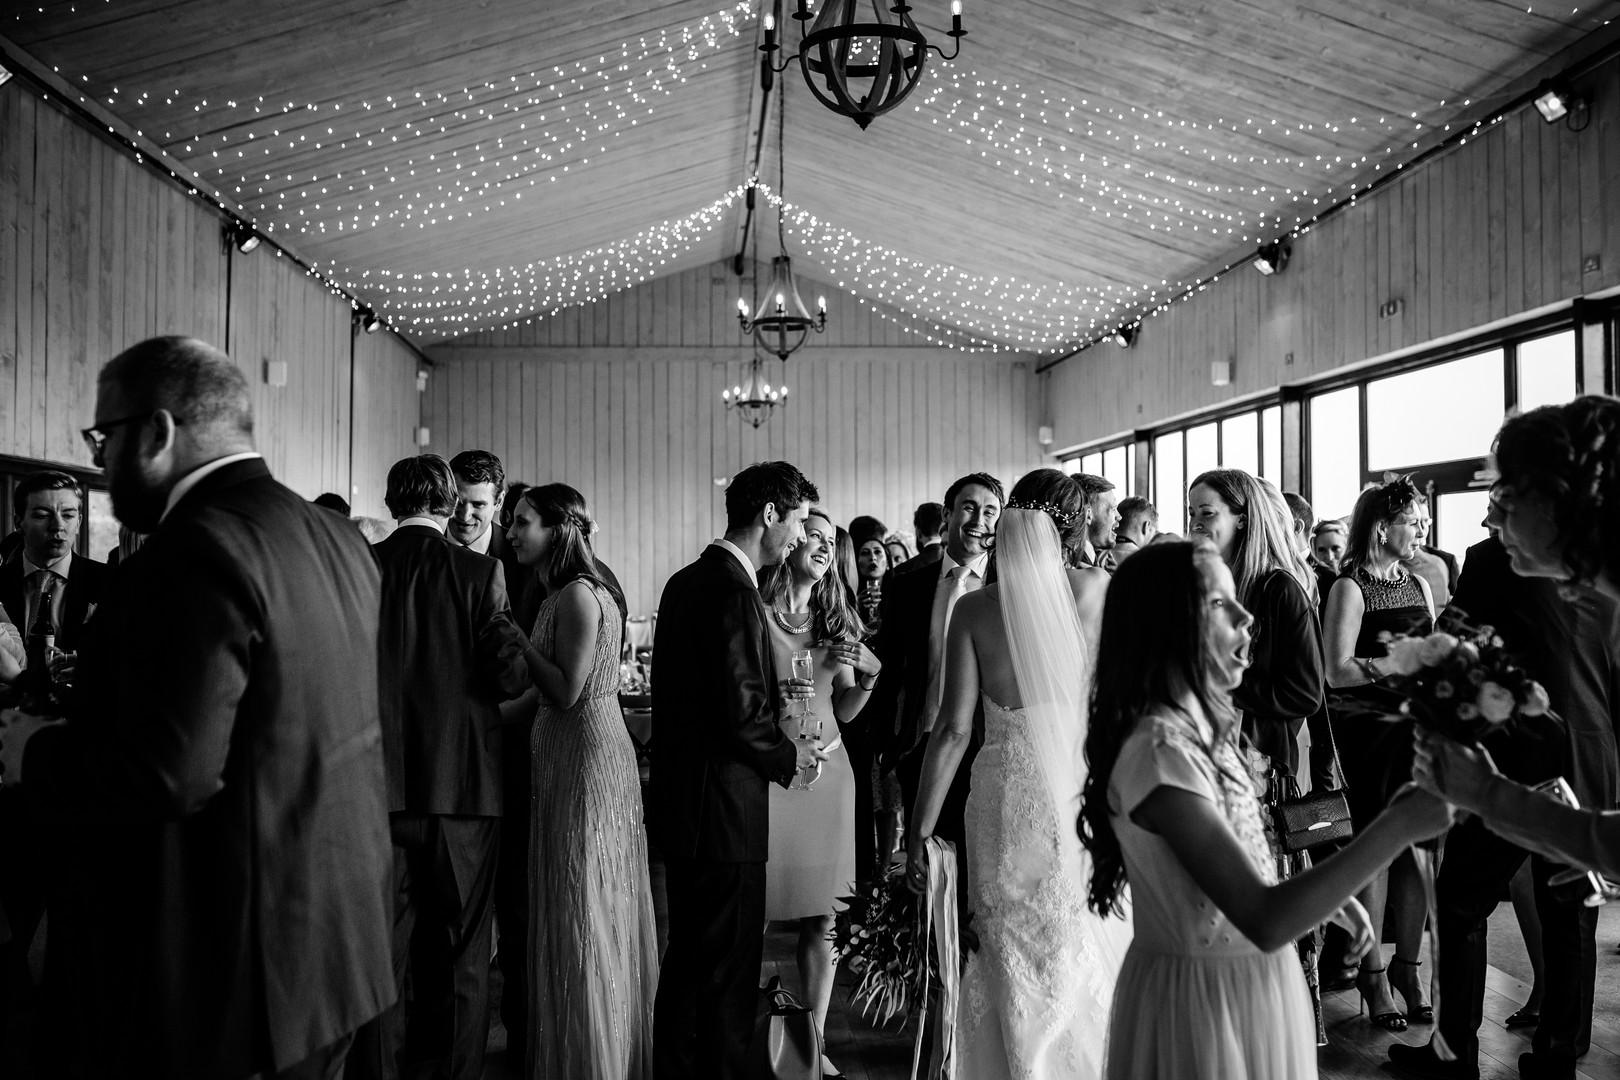 Primrose Hill Farm Wedding Venue Reception